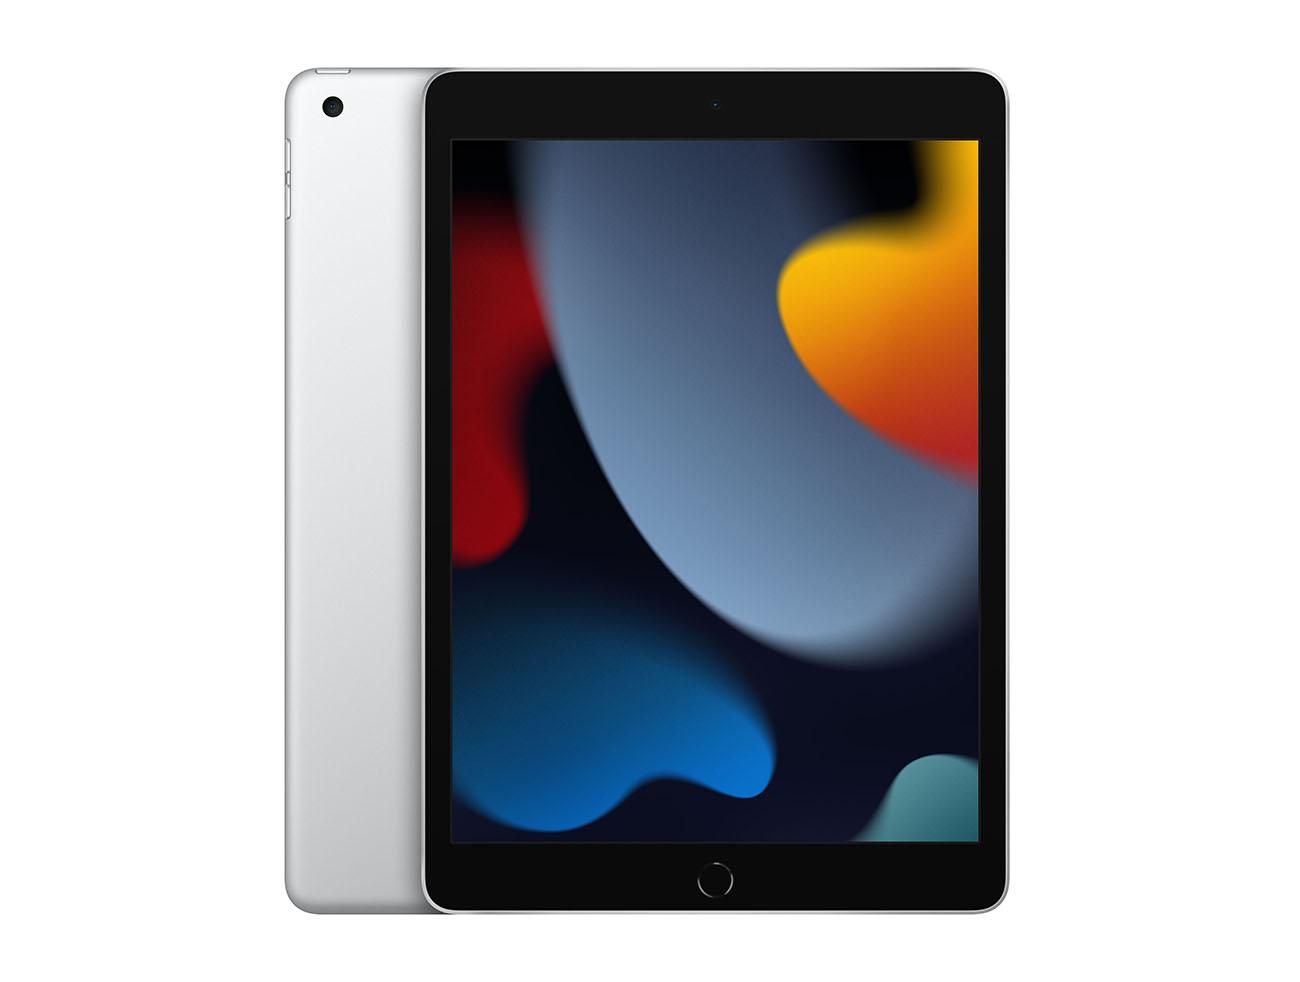 iPad 9ης γενιάς: Διαθέσιμο στα καταστήματα COSMOTE – ΓΕΡΜΑΝΟΣ